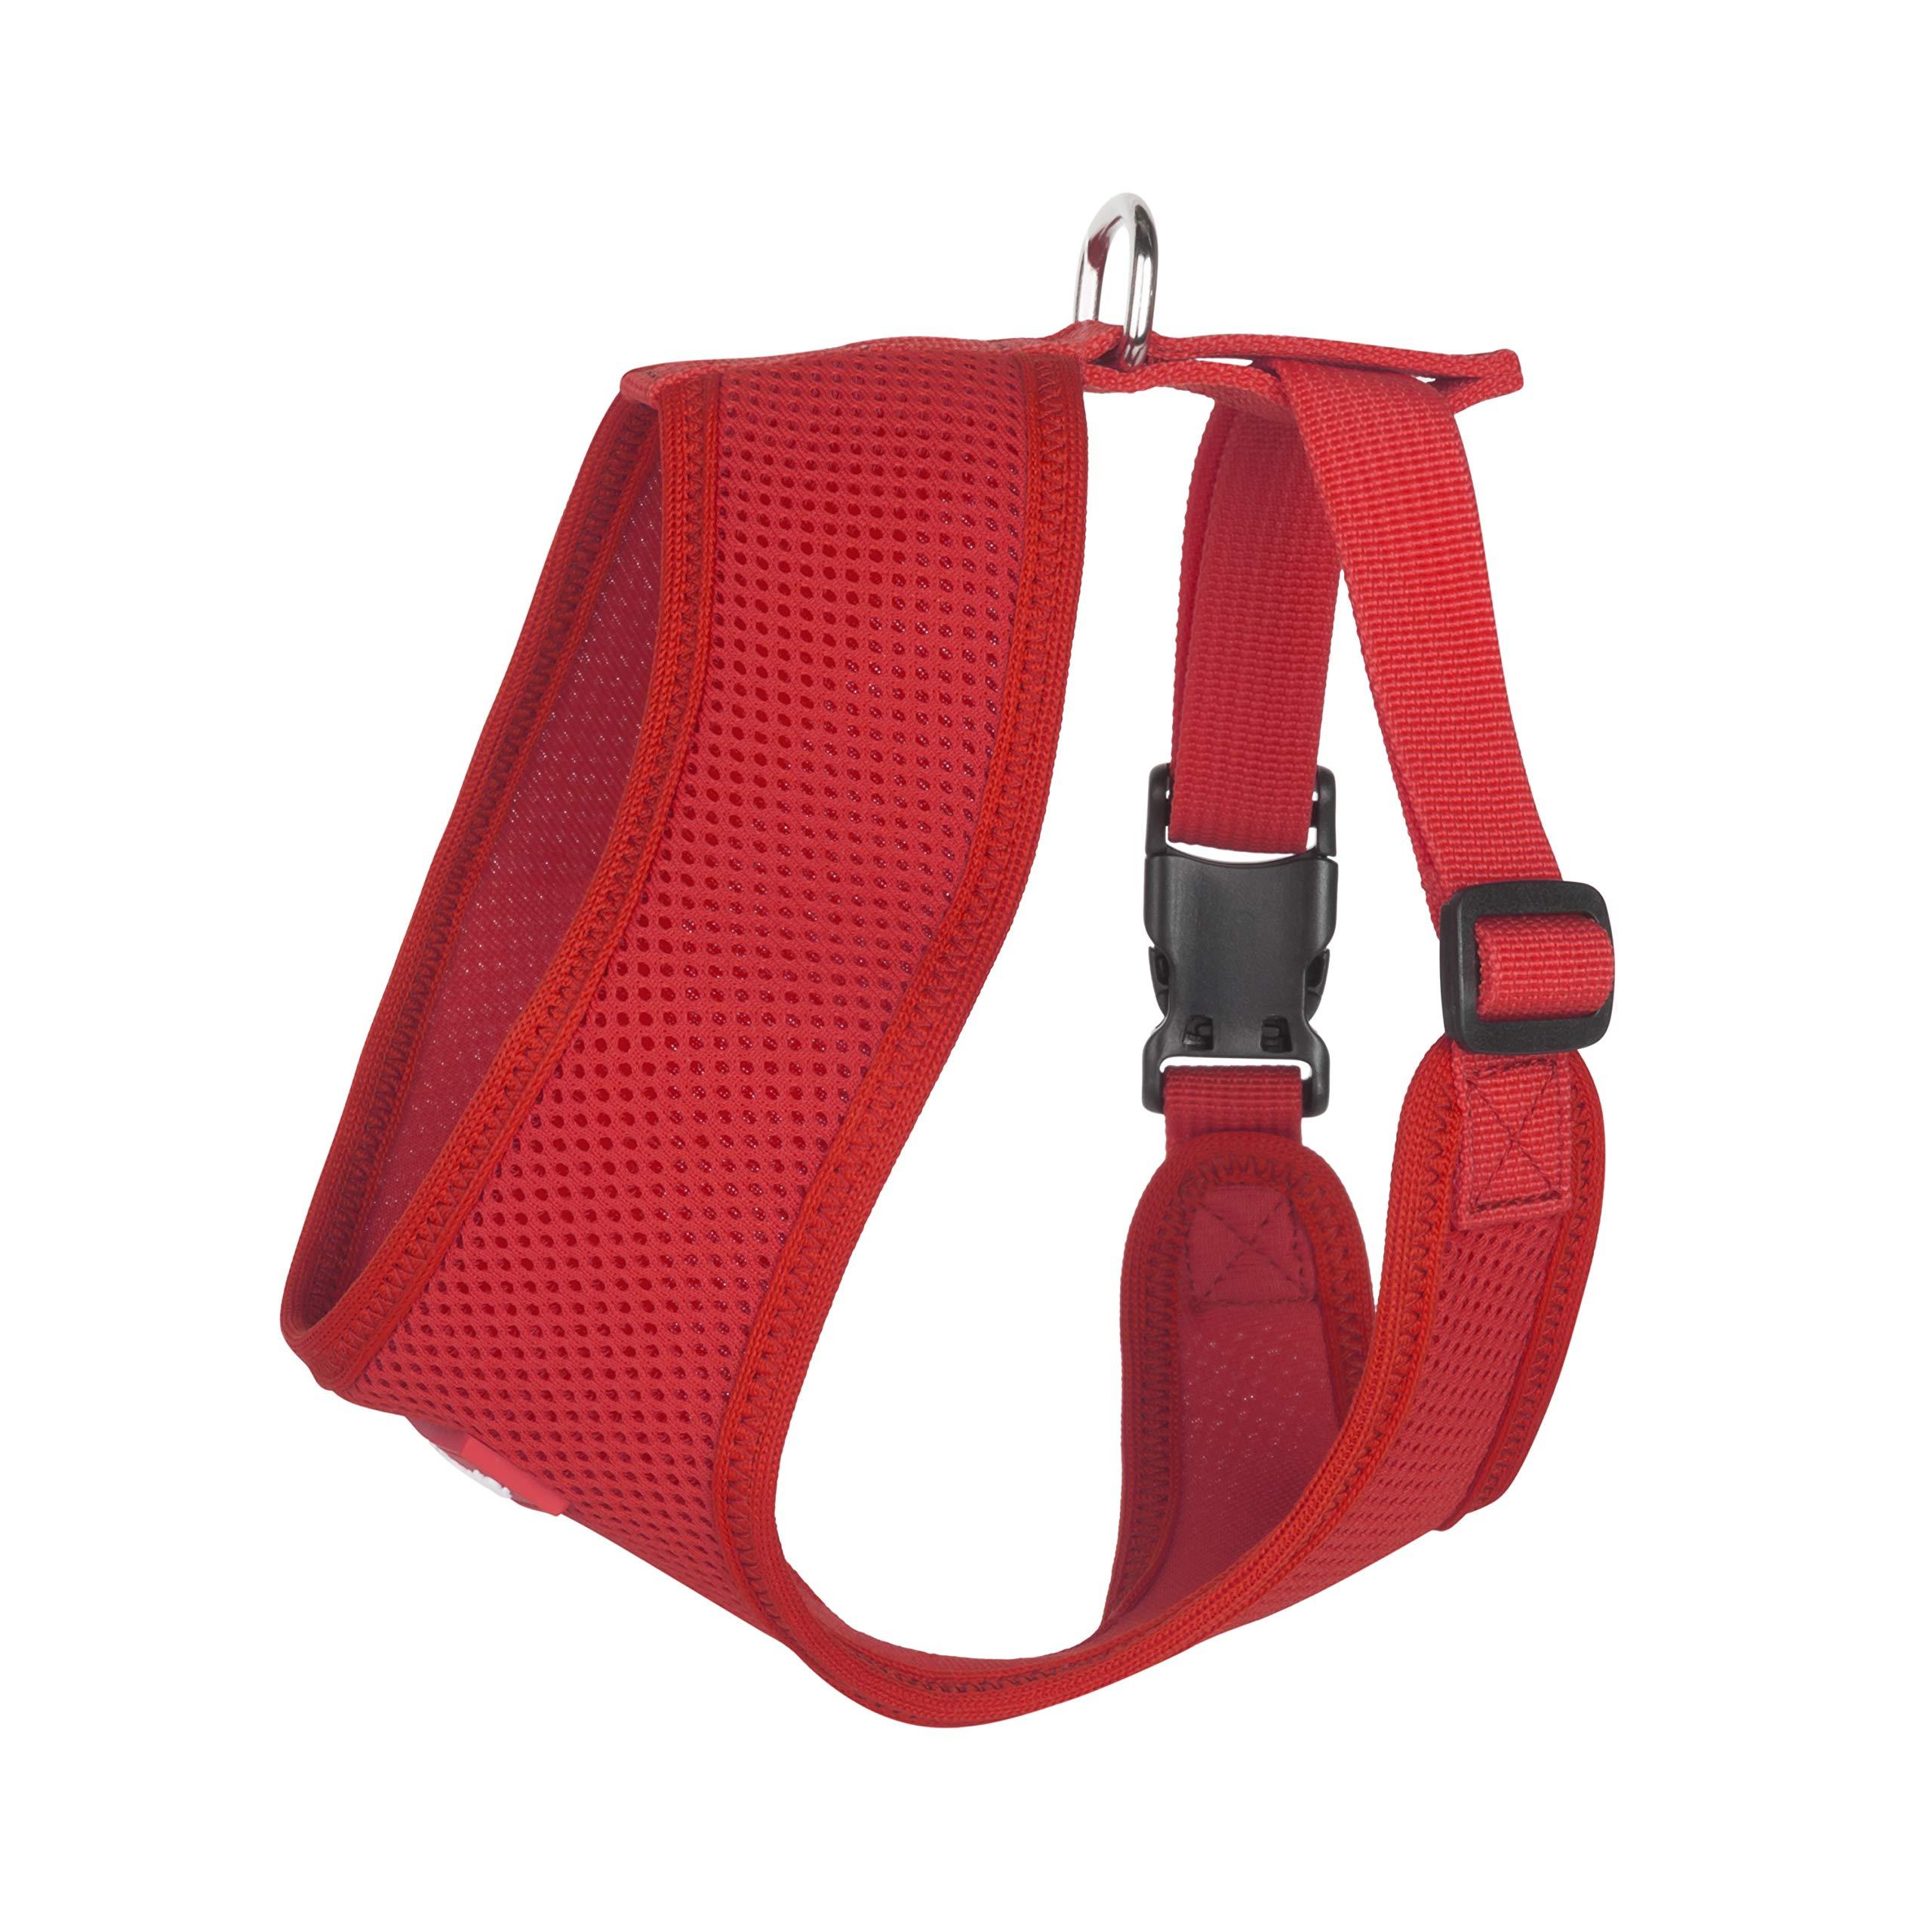 Hip Doggie Award Winning, Ultra Comfort Red Mesh Harness Vest - S